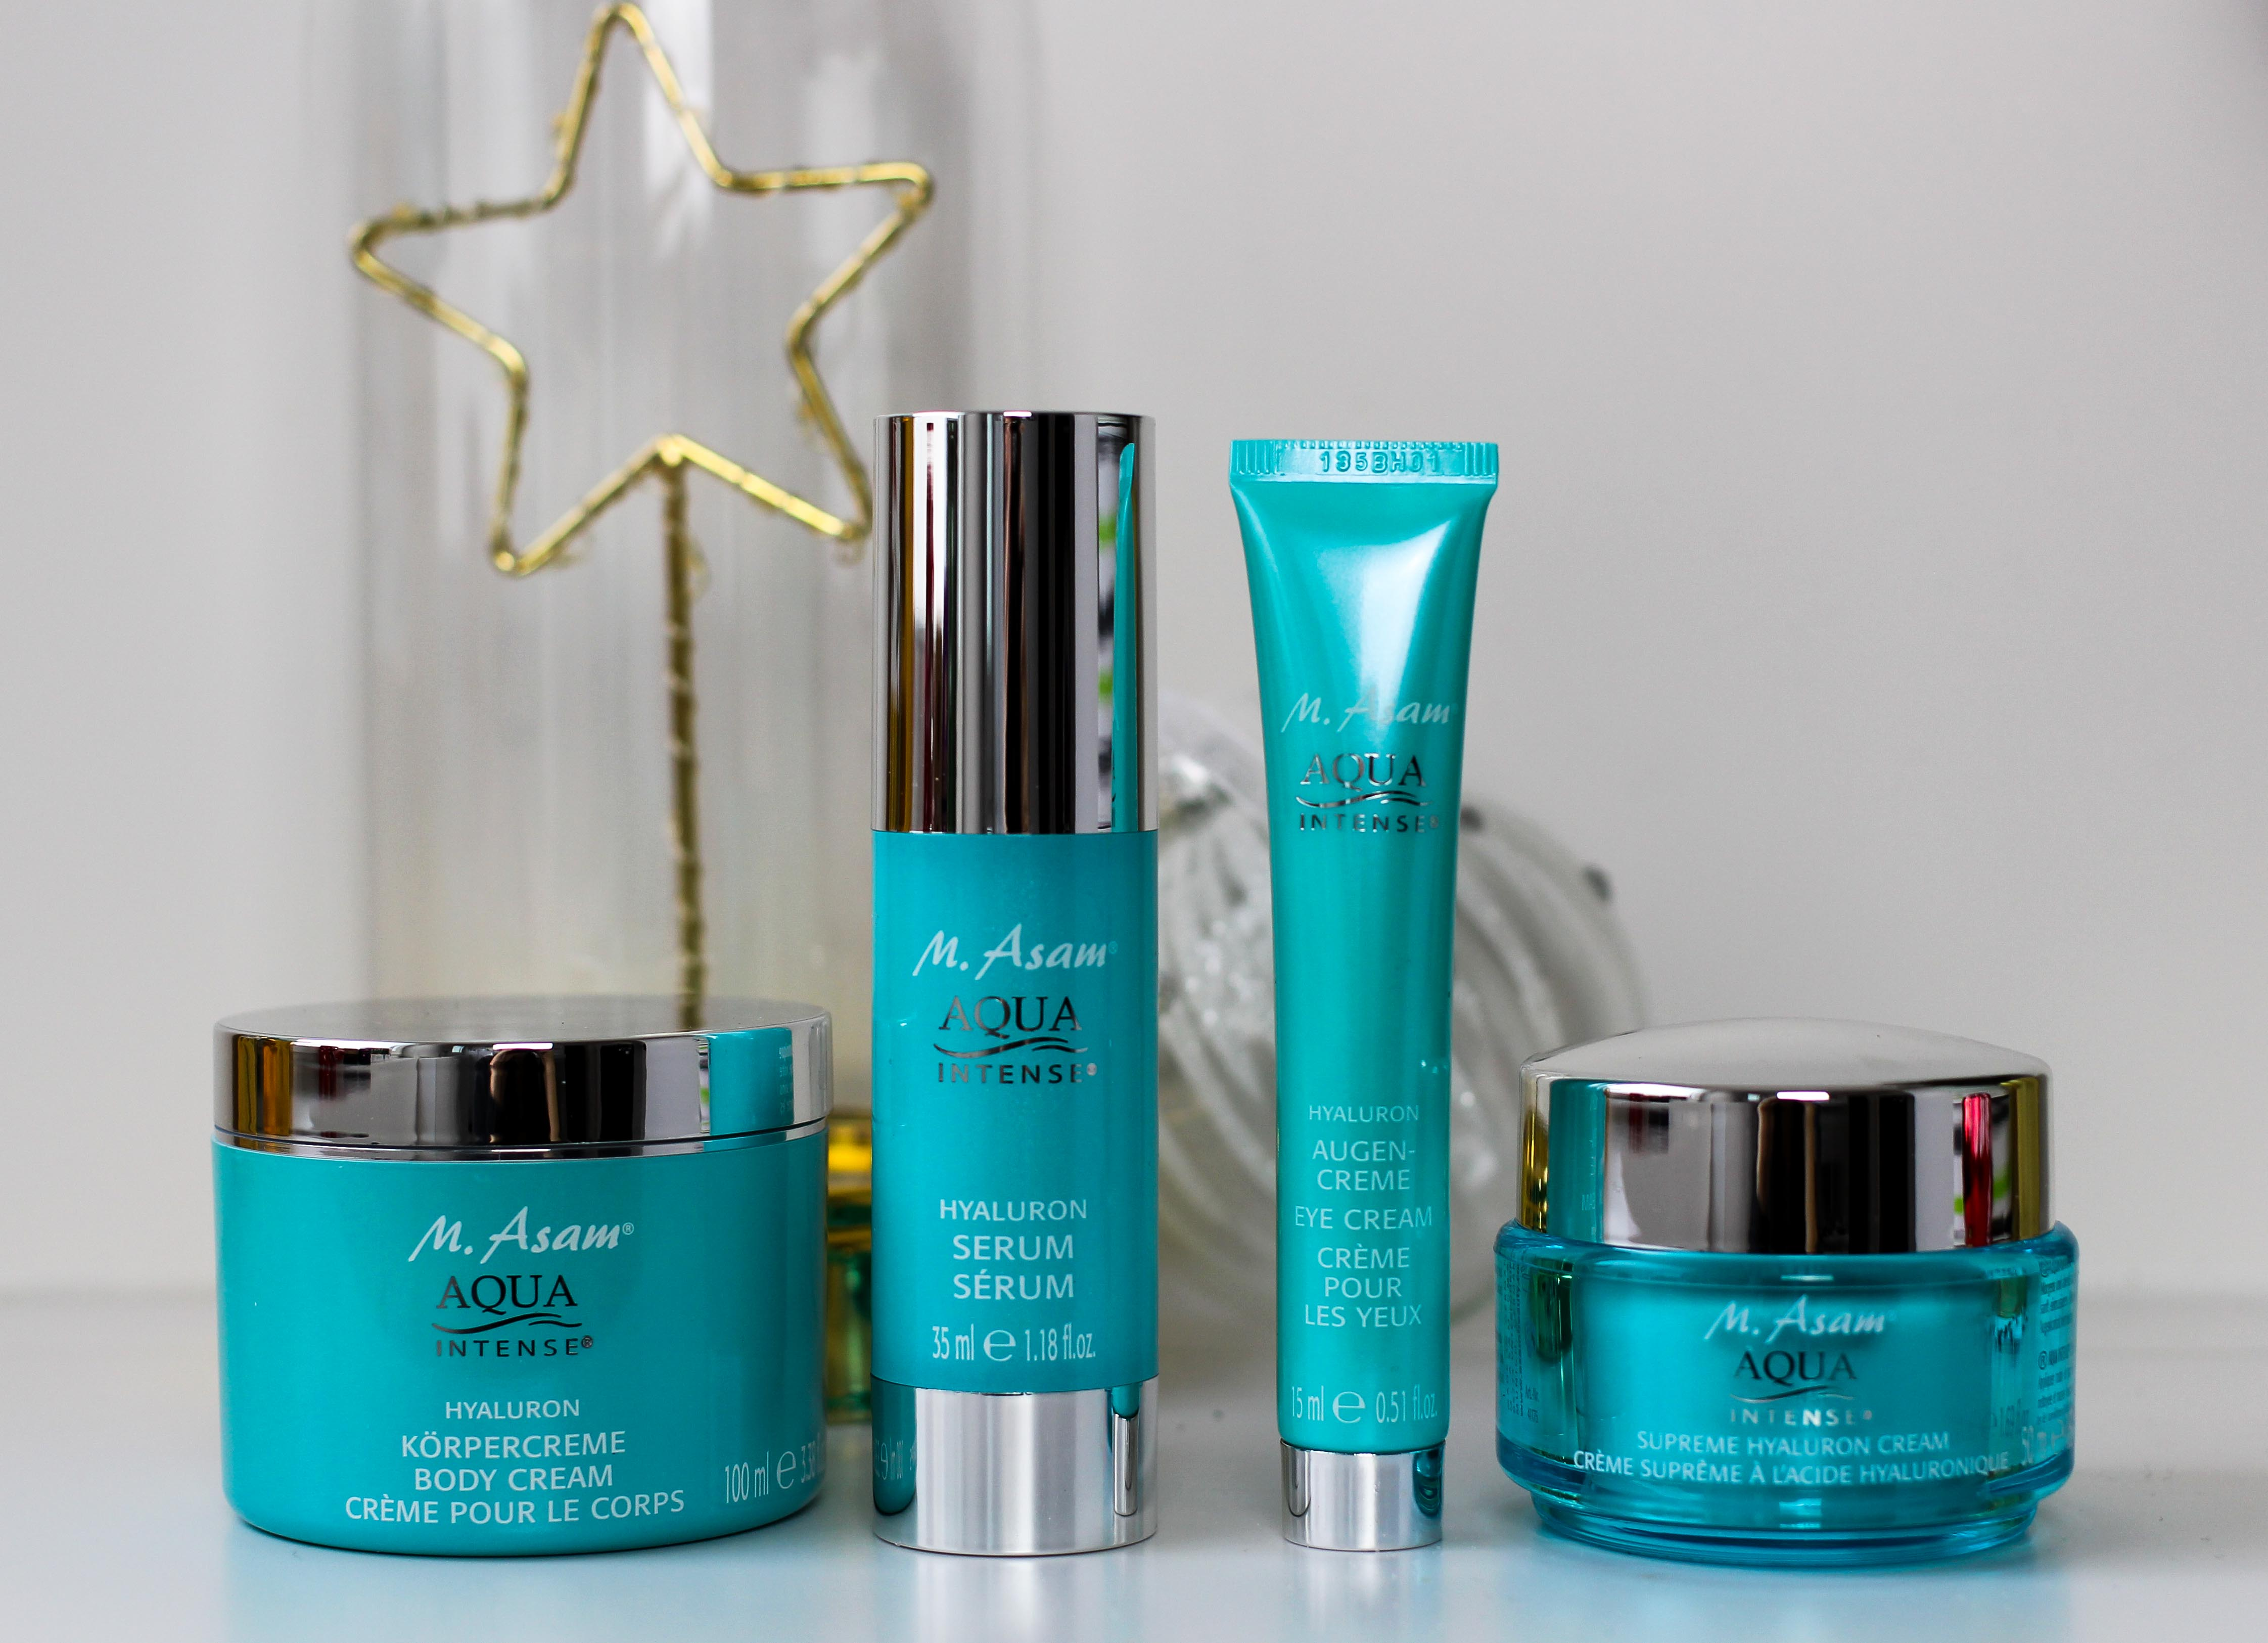 Adventskalender Blogger Deutschland 4-Teiliges Aqua Intense-Set Asambeauty Weihnachtsgeschenk Idee Beauty-Paket 4